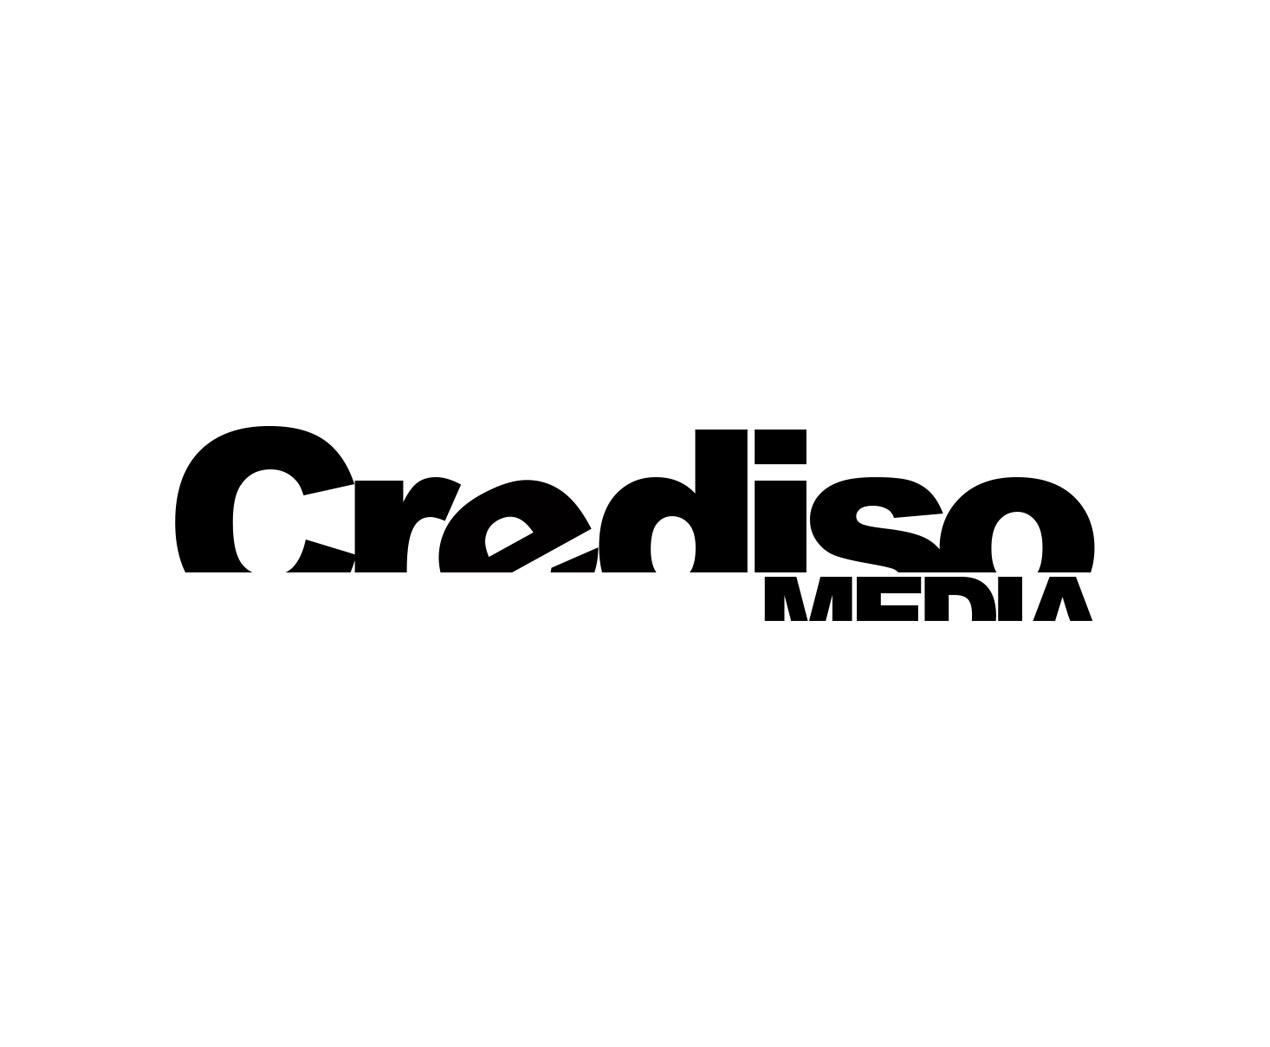 Crediso Media GmbH